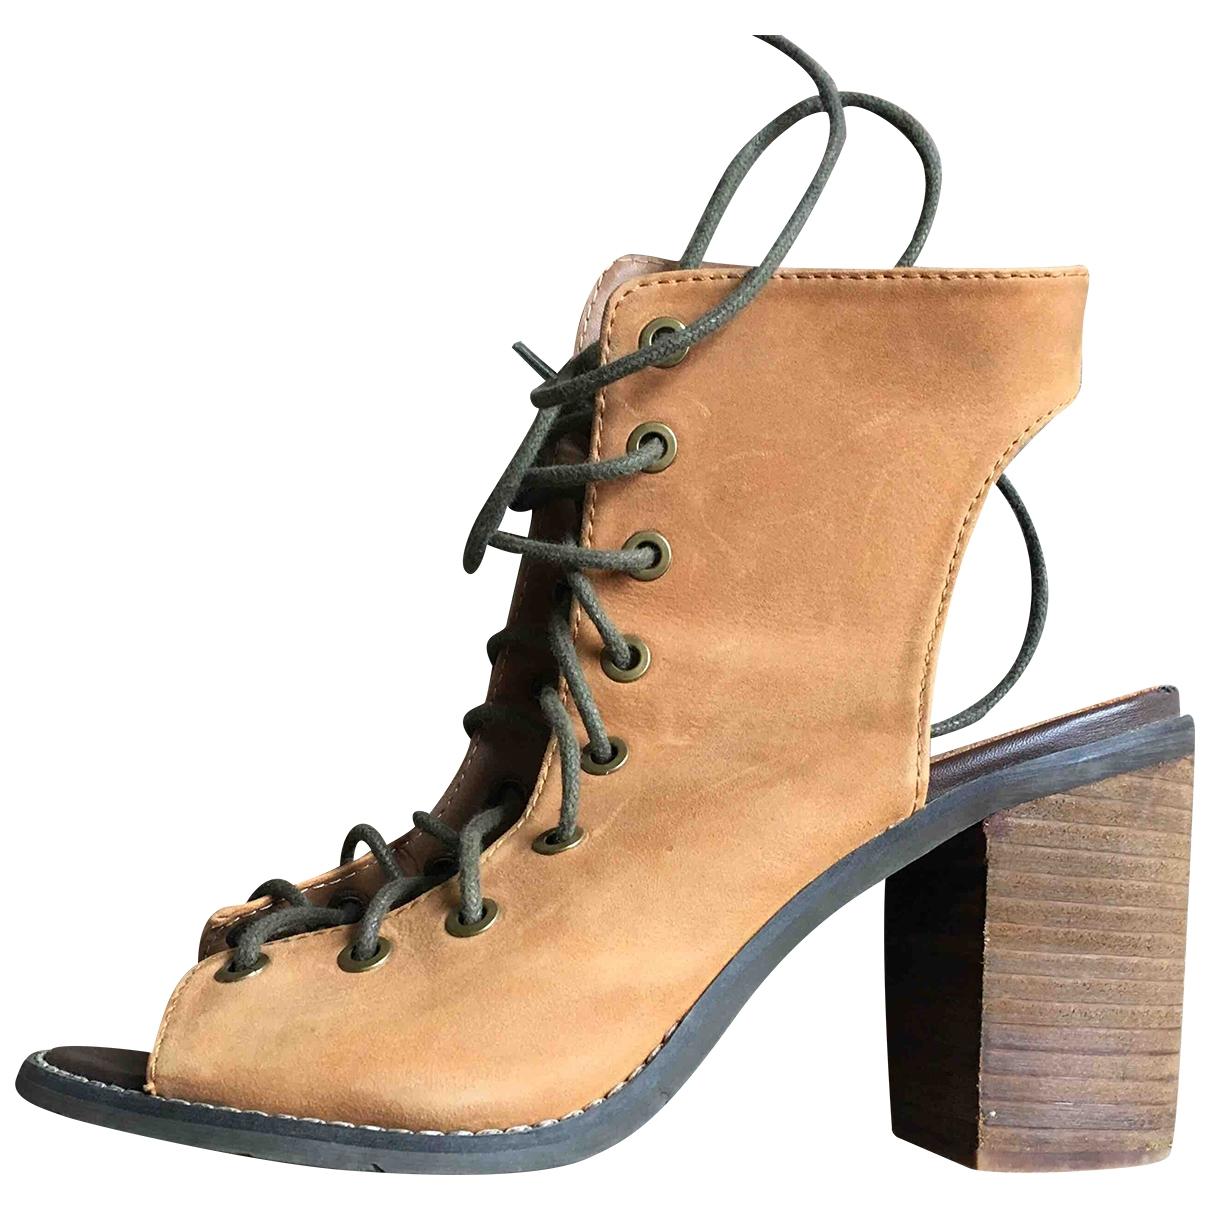 Sandalias de Cuero Ann Demeulemeester